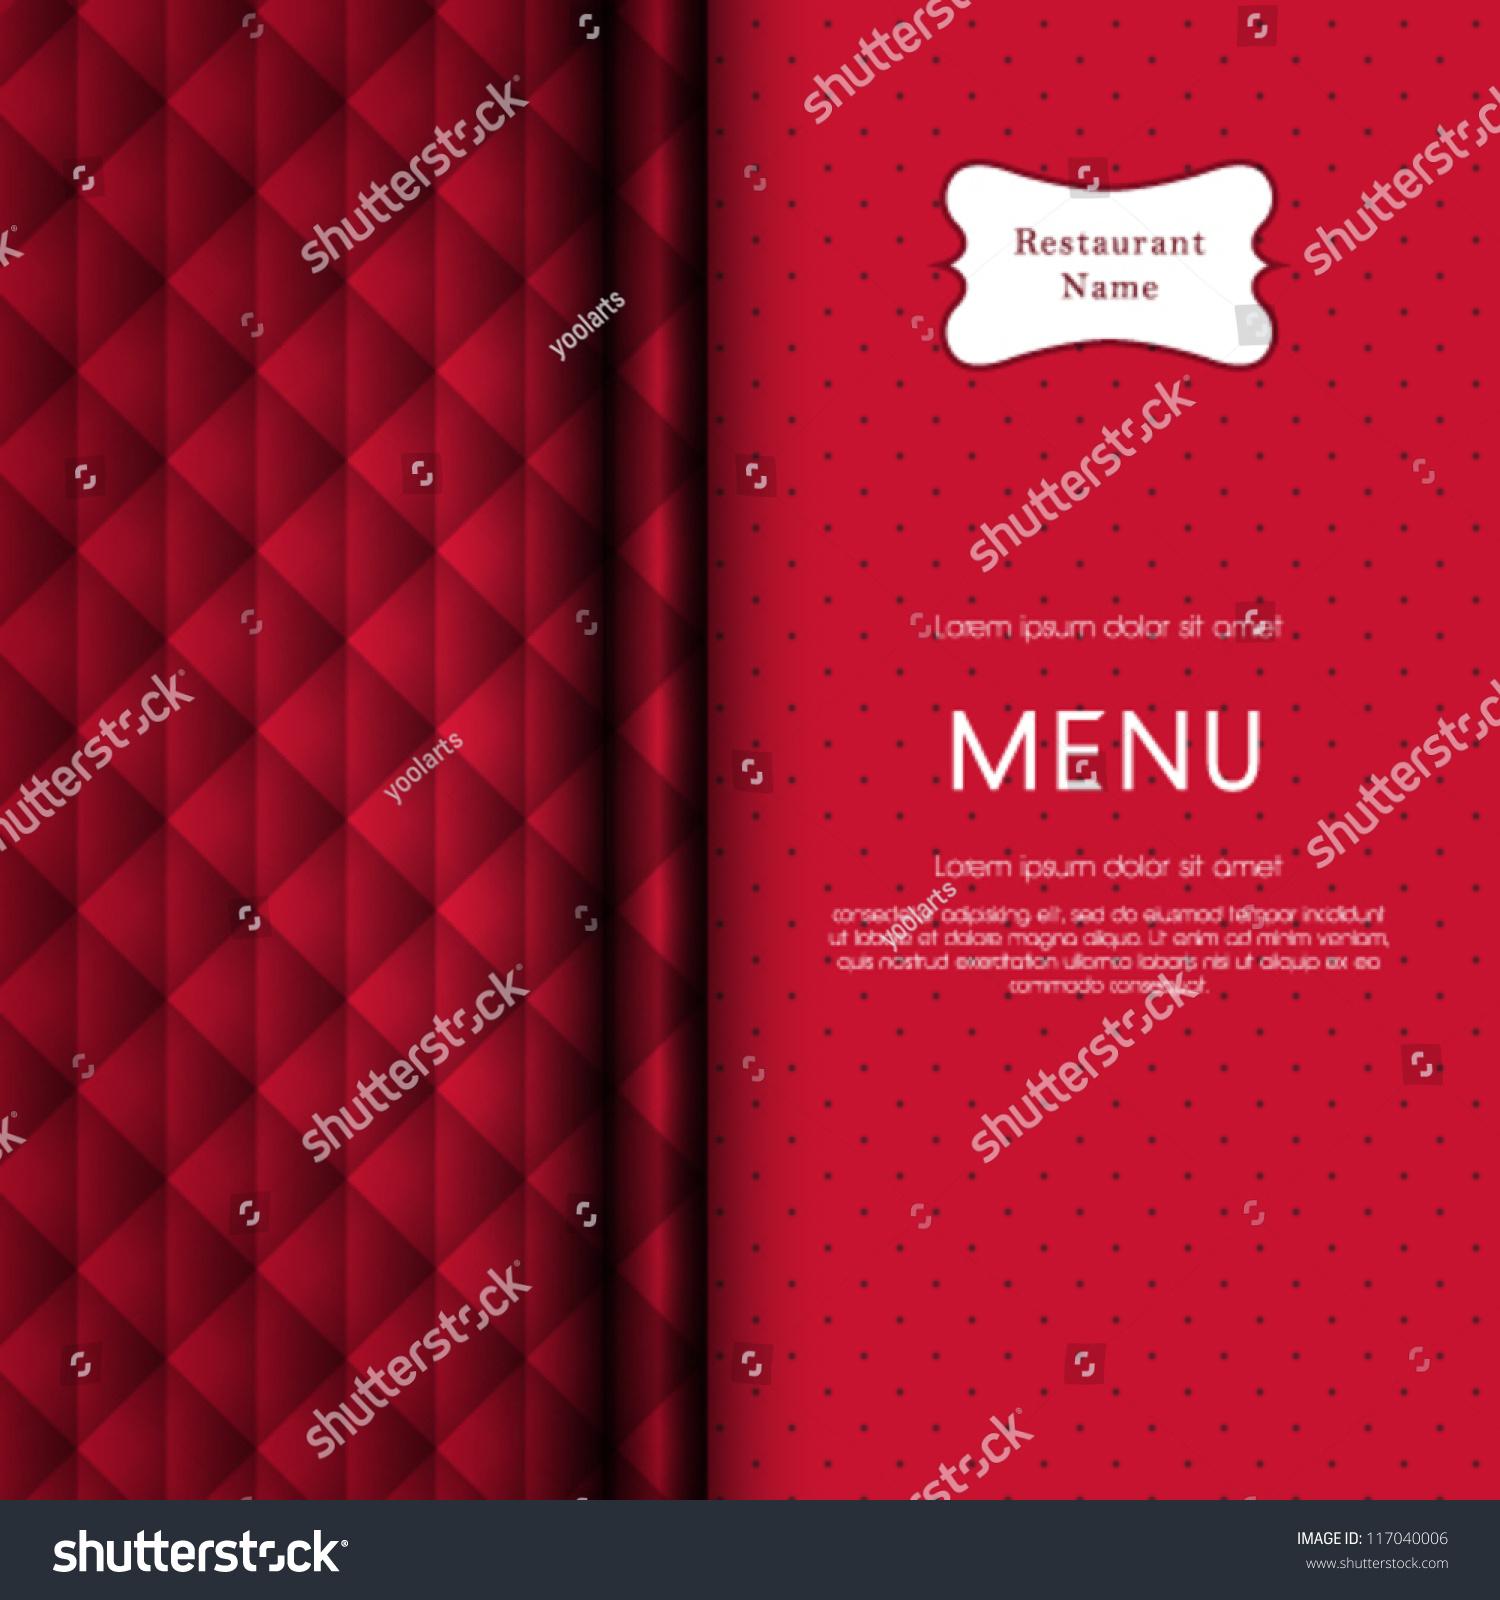 vector restaurant menu cover design stock vector 117040006